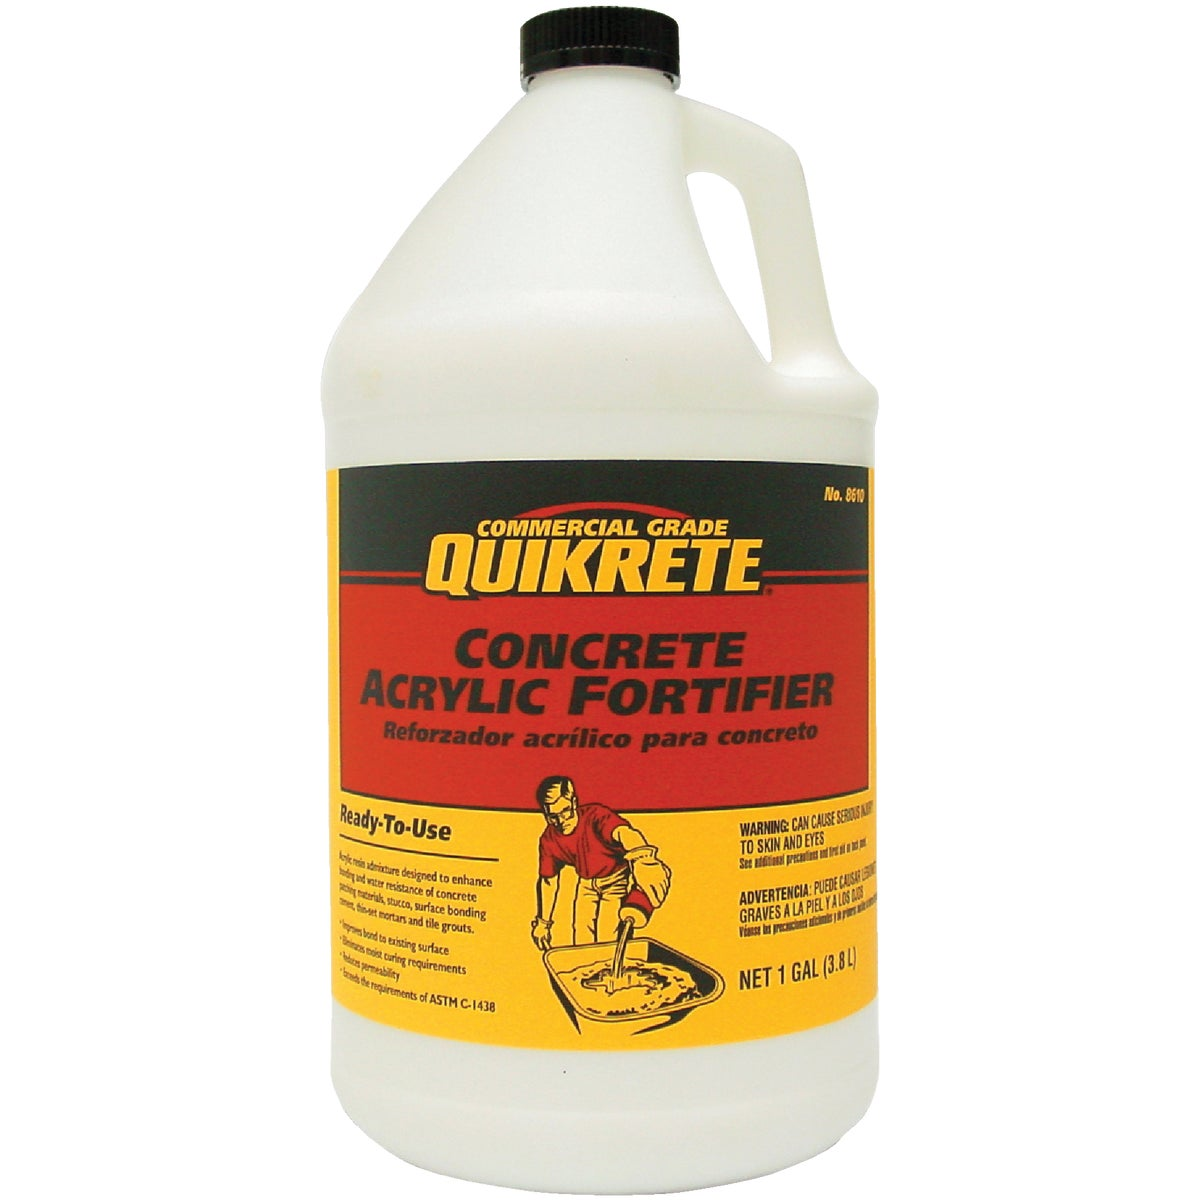 Quikrete 861001 Concrete Acrylic Fortifier